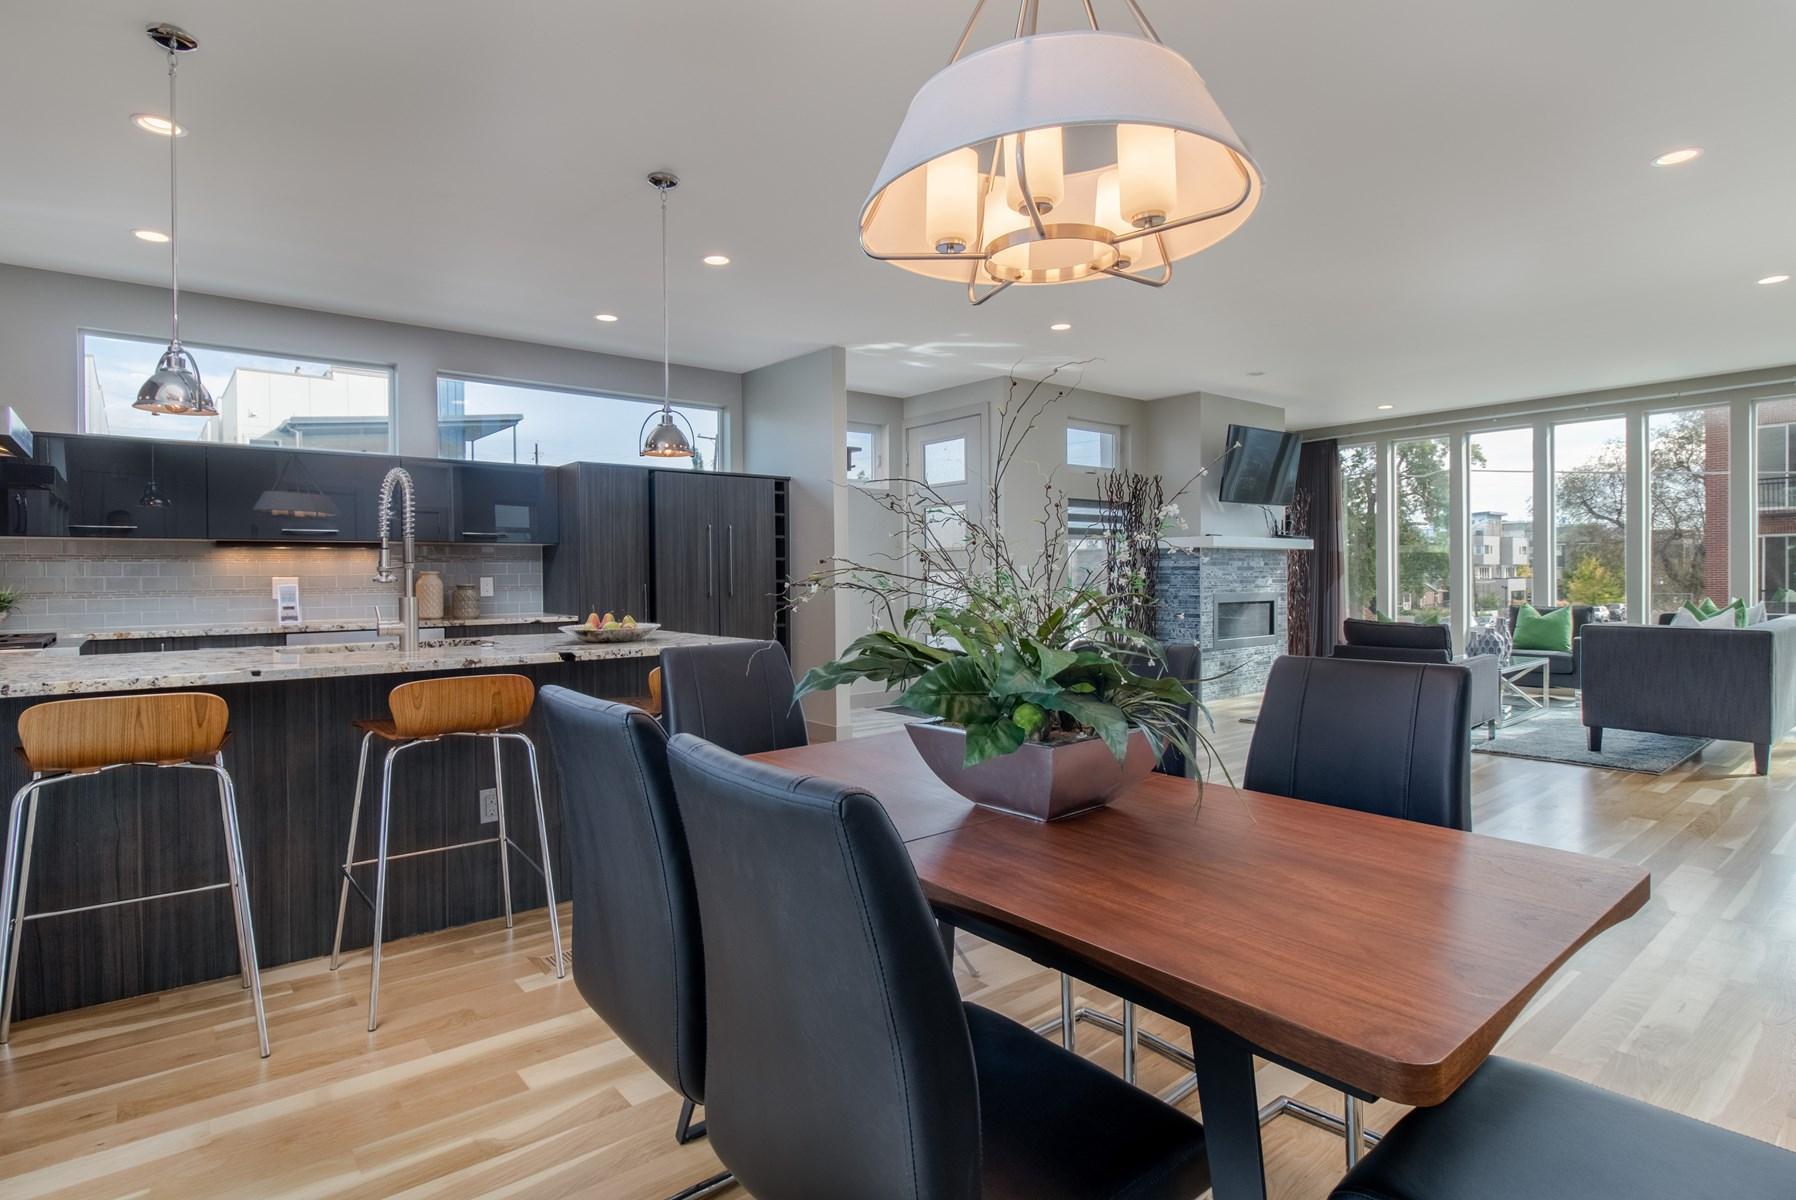 2499 Decatur St, Denver, CO, Denver Luxury Home For Sale